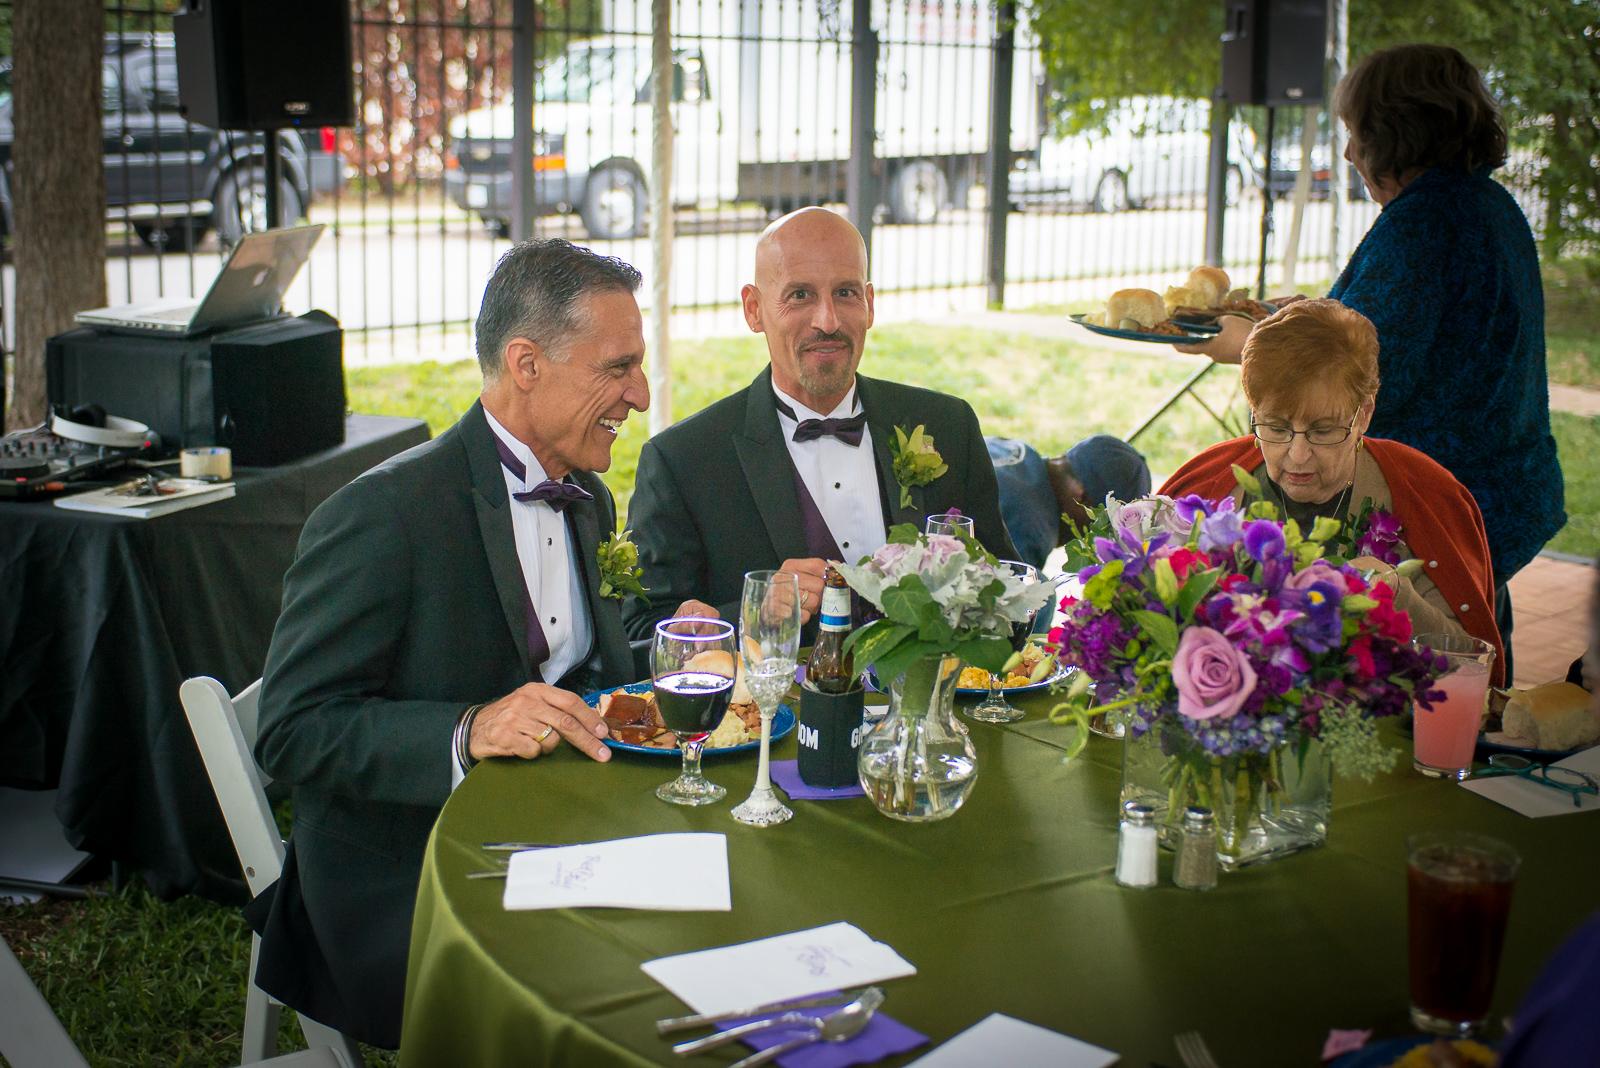 Michael-Napier-Weddings-Ludwig-Guilbeau Wedding-20 (27).jpg